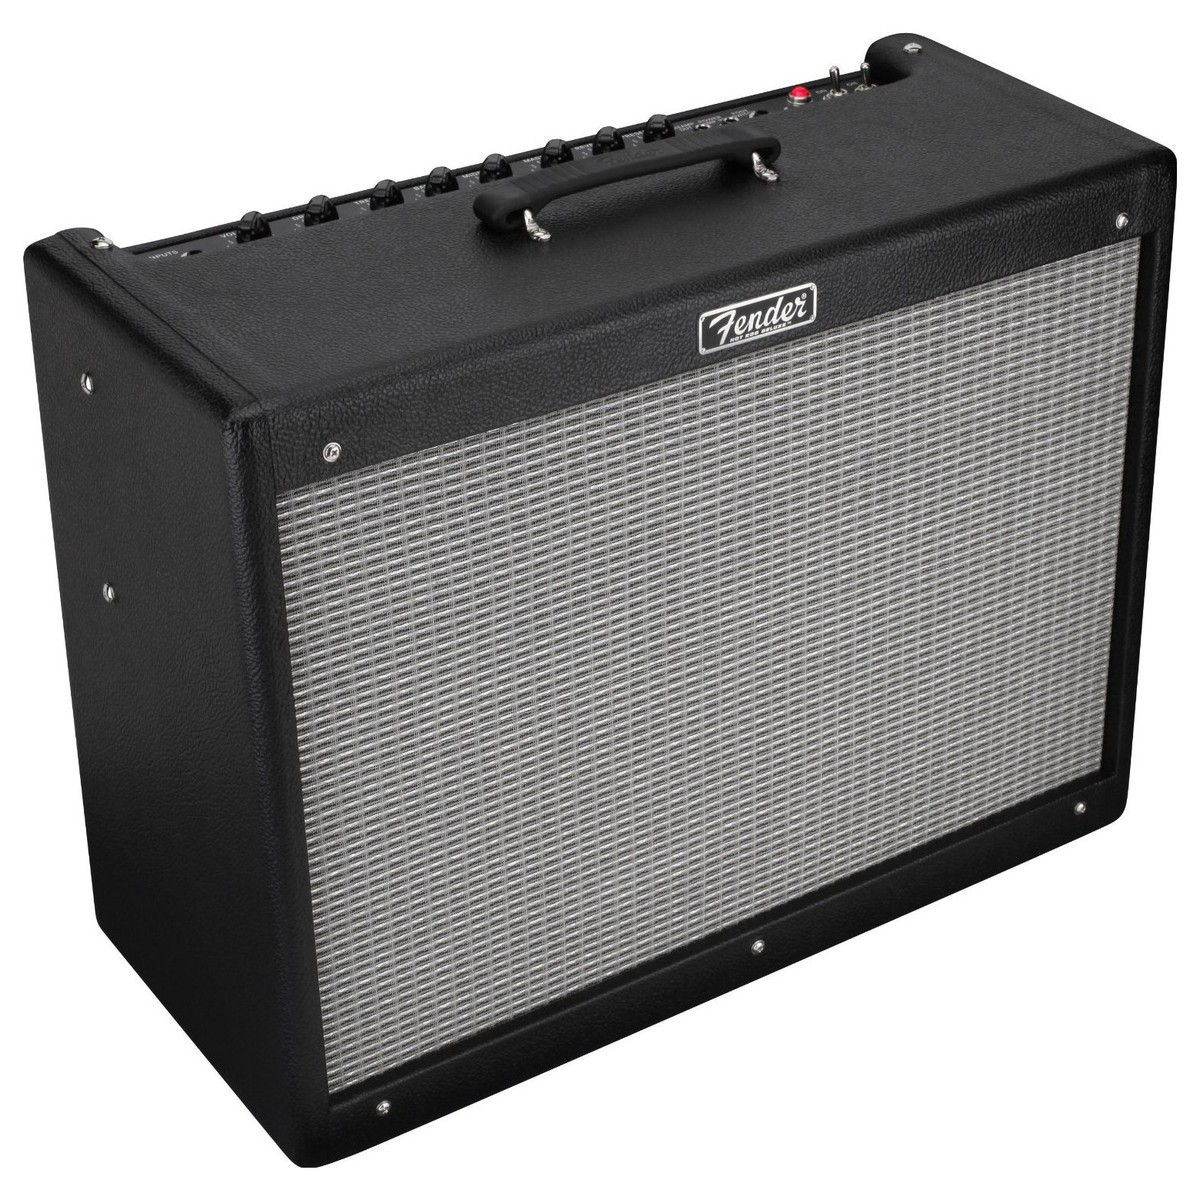 fender hot rod deluxe iii 40w tube guitar amplifier at. Black Bedroom Furniture Sets. Home Design Ideas